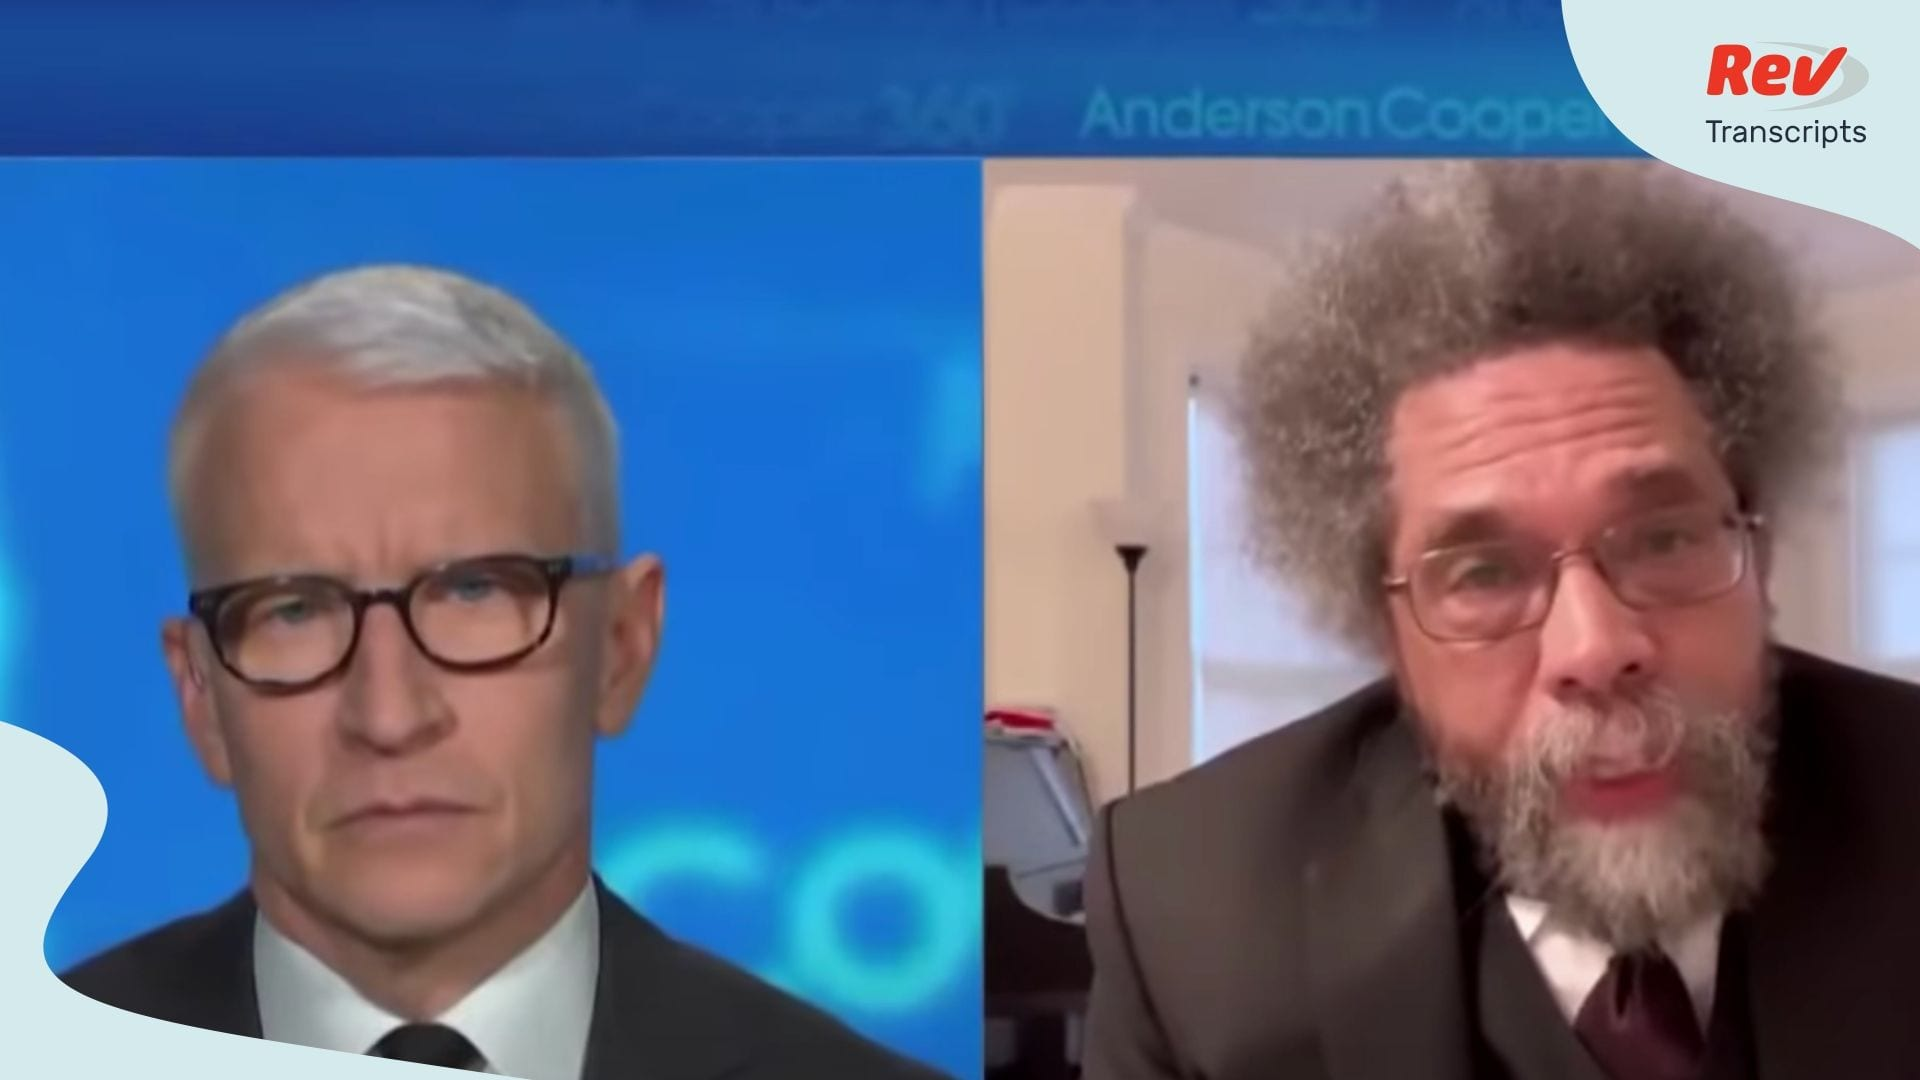 Dr. Cornel West Speech Transcript in Anderson Cooper Interview